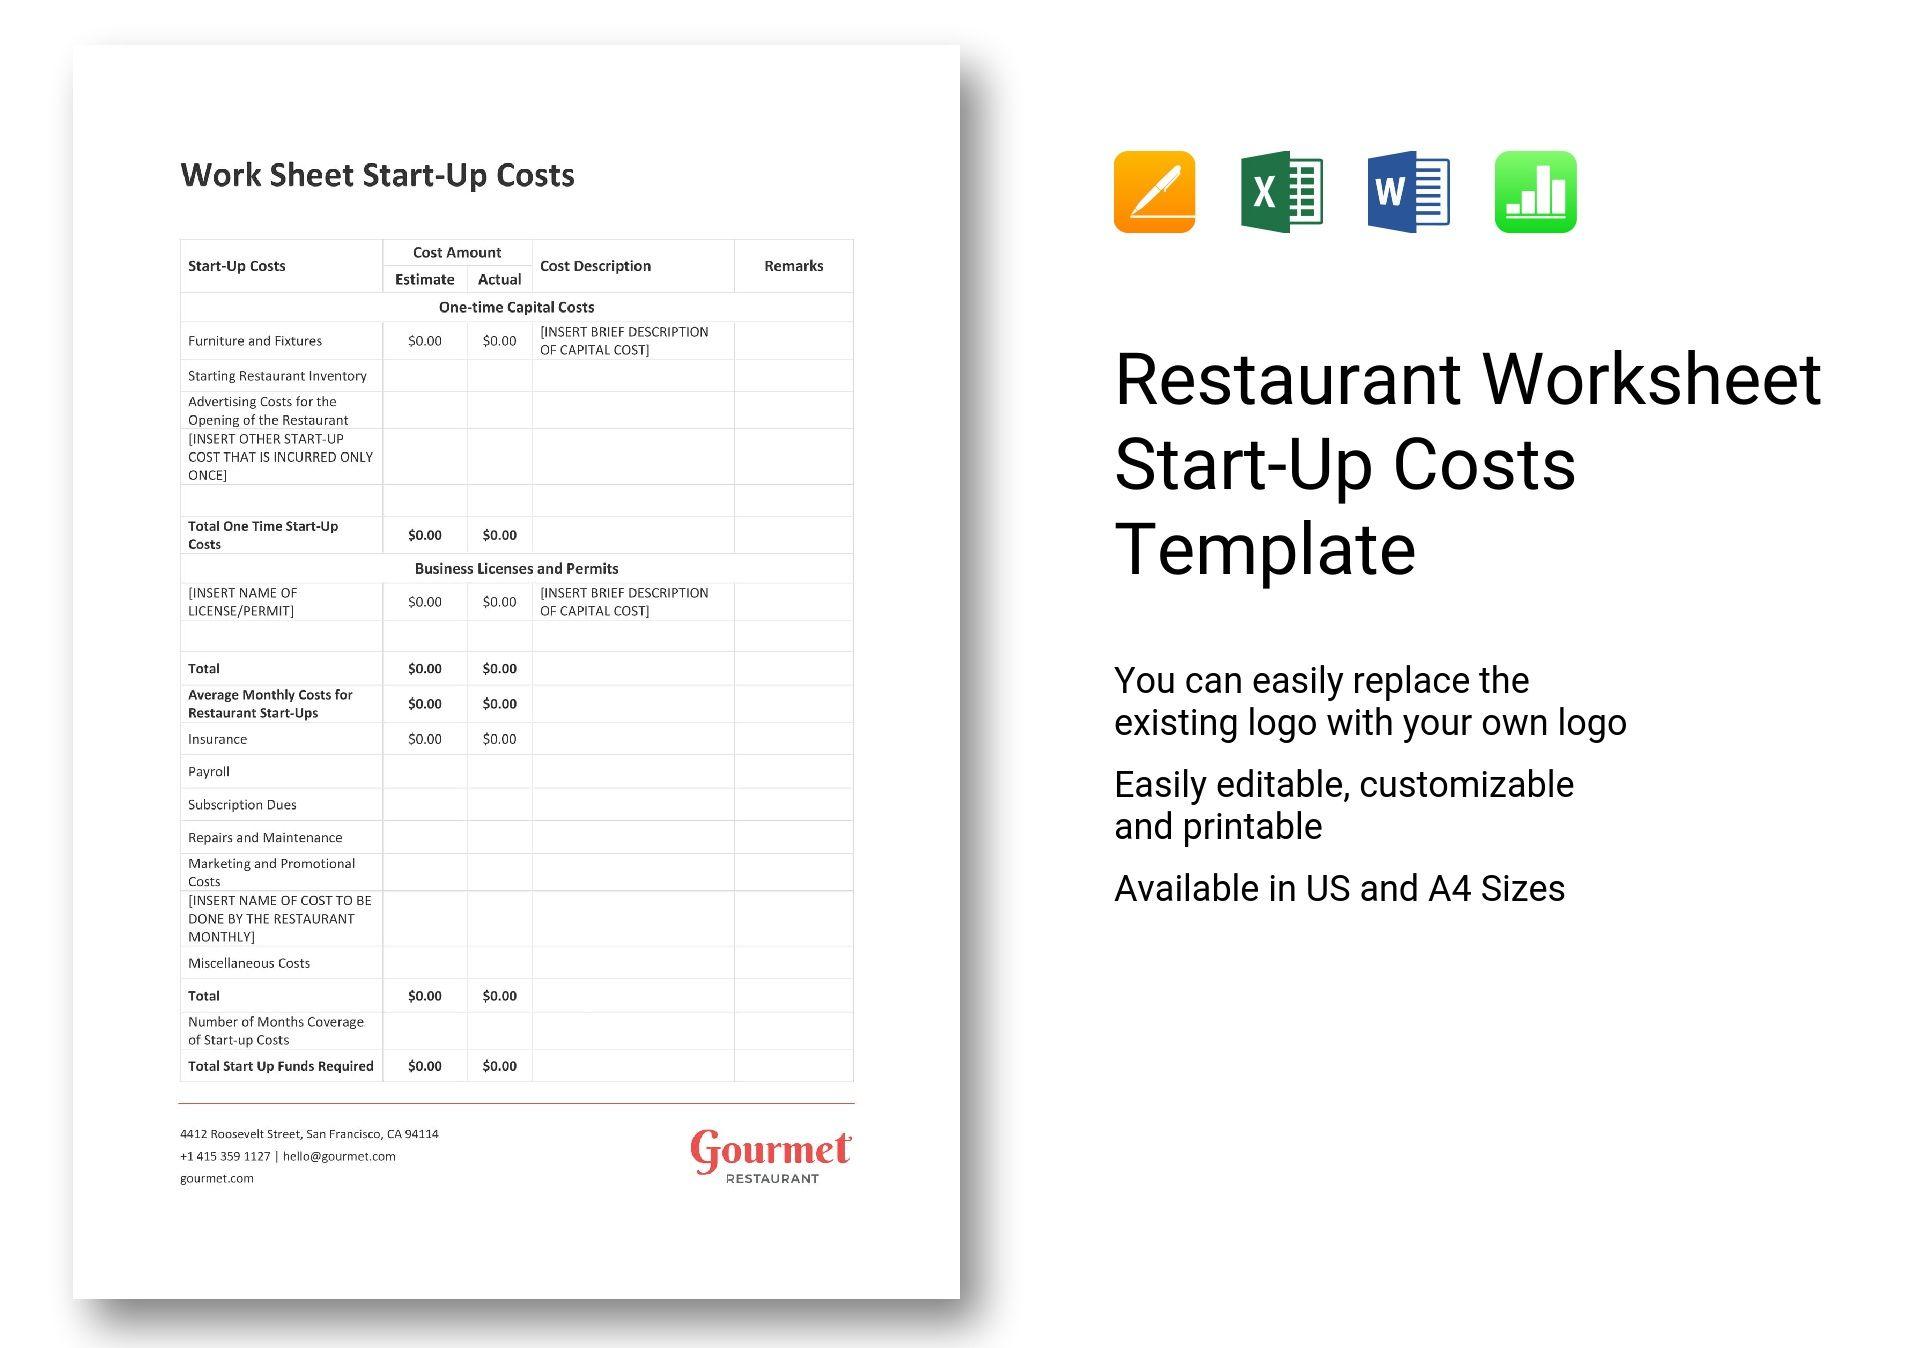 Restaurant Worksheet Start Up Costs Template In Word